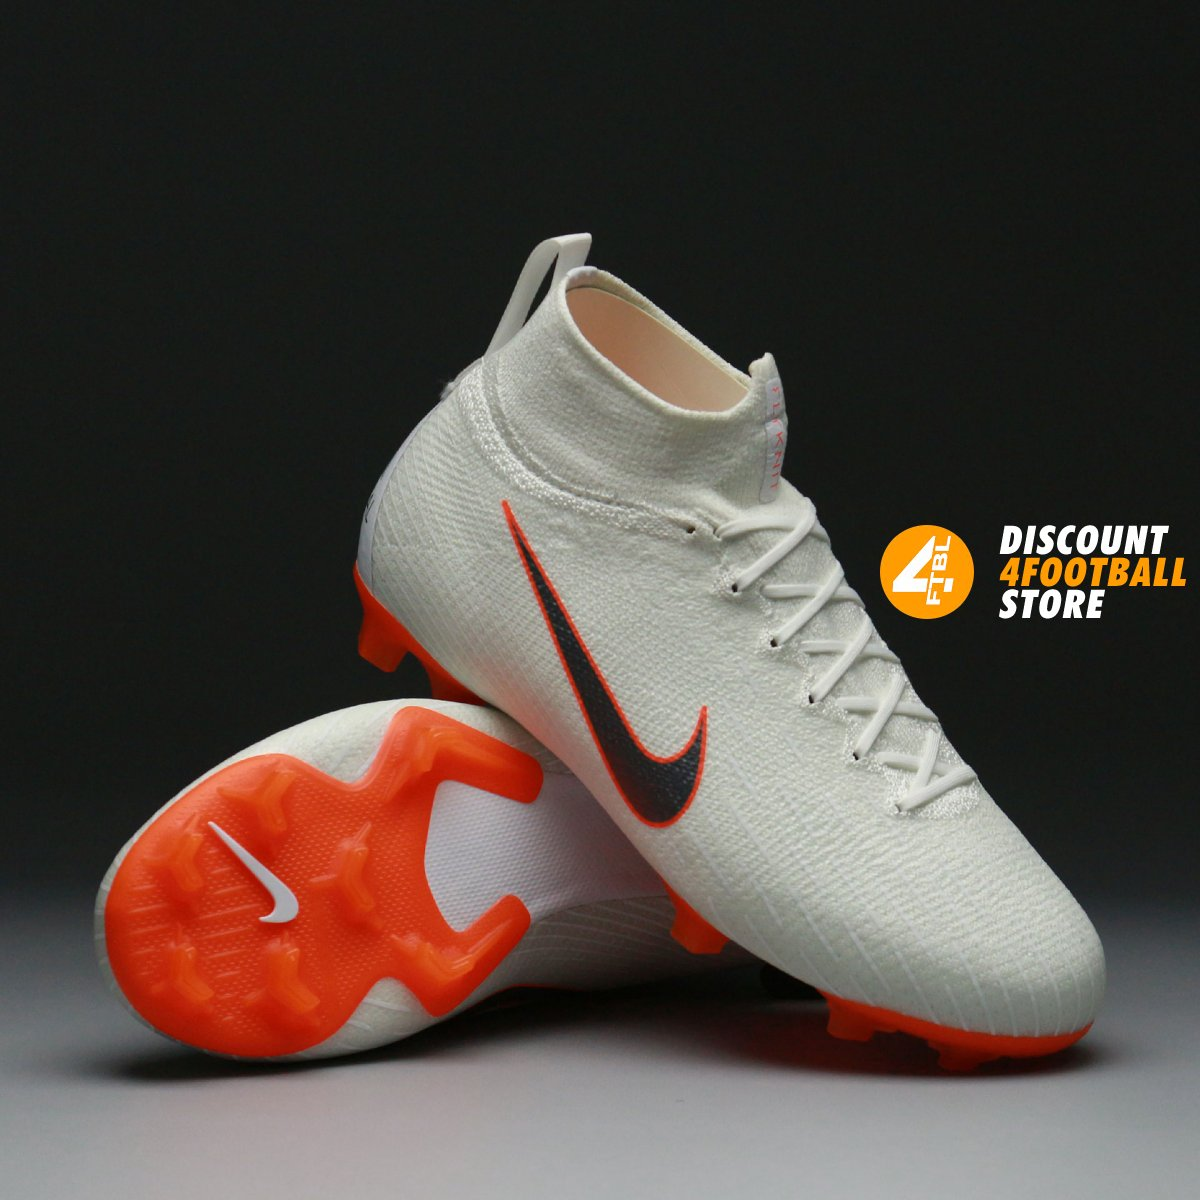 877bfbb5 Детские бутсы Nike Mercurial SUPERFLY ELITE AH7340-107 купить на ...